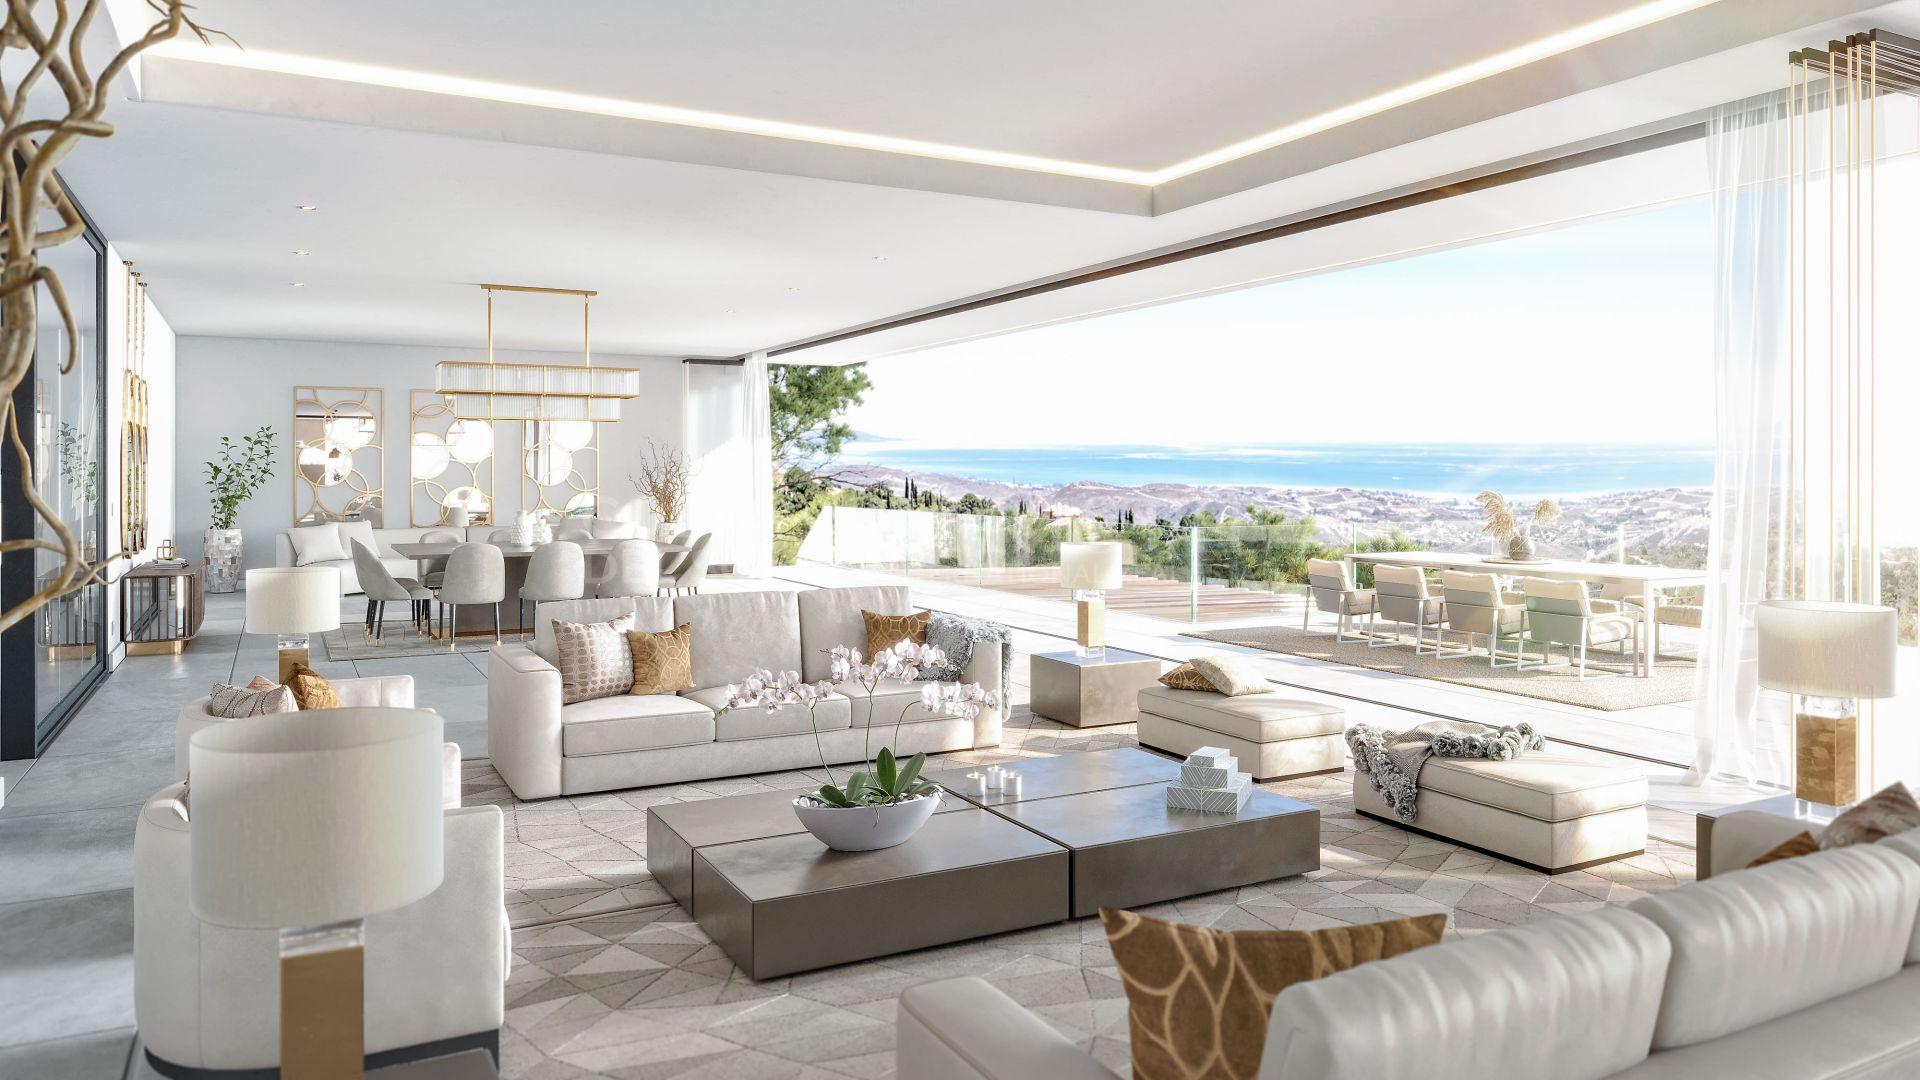 Luxury Villa C8 in The Secret Marbella, Real de la Quinta | Christie's International Real Estate